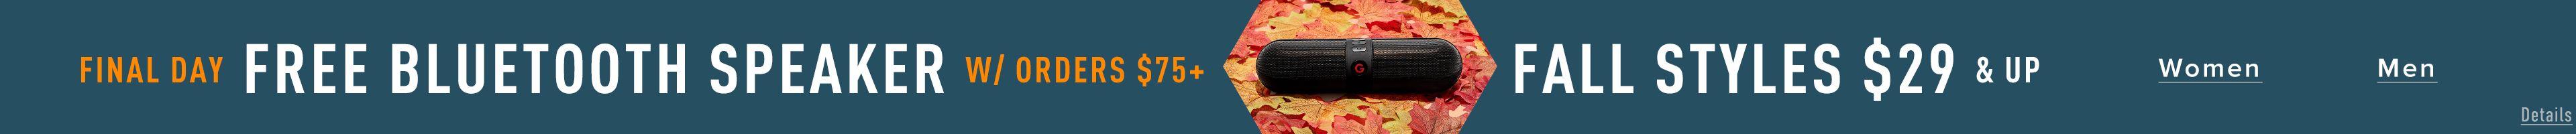 Free Bluetooth Speaker